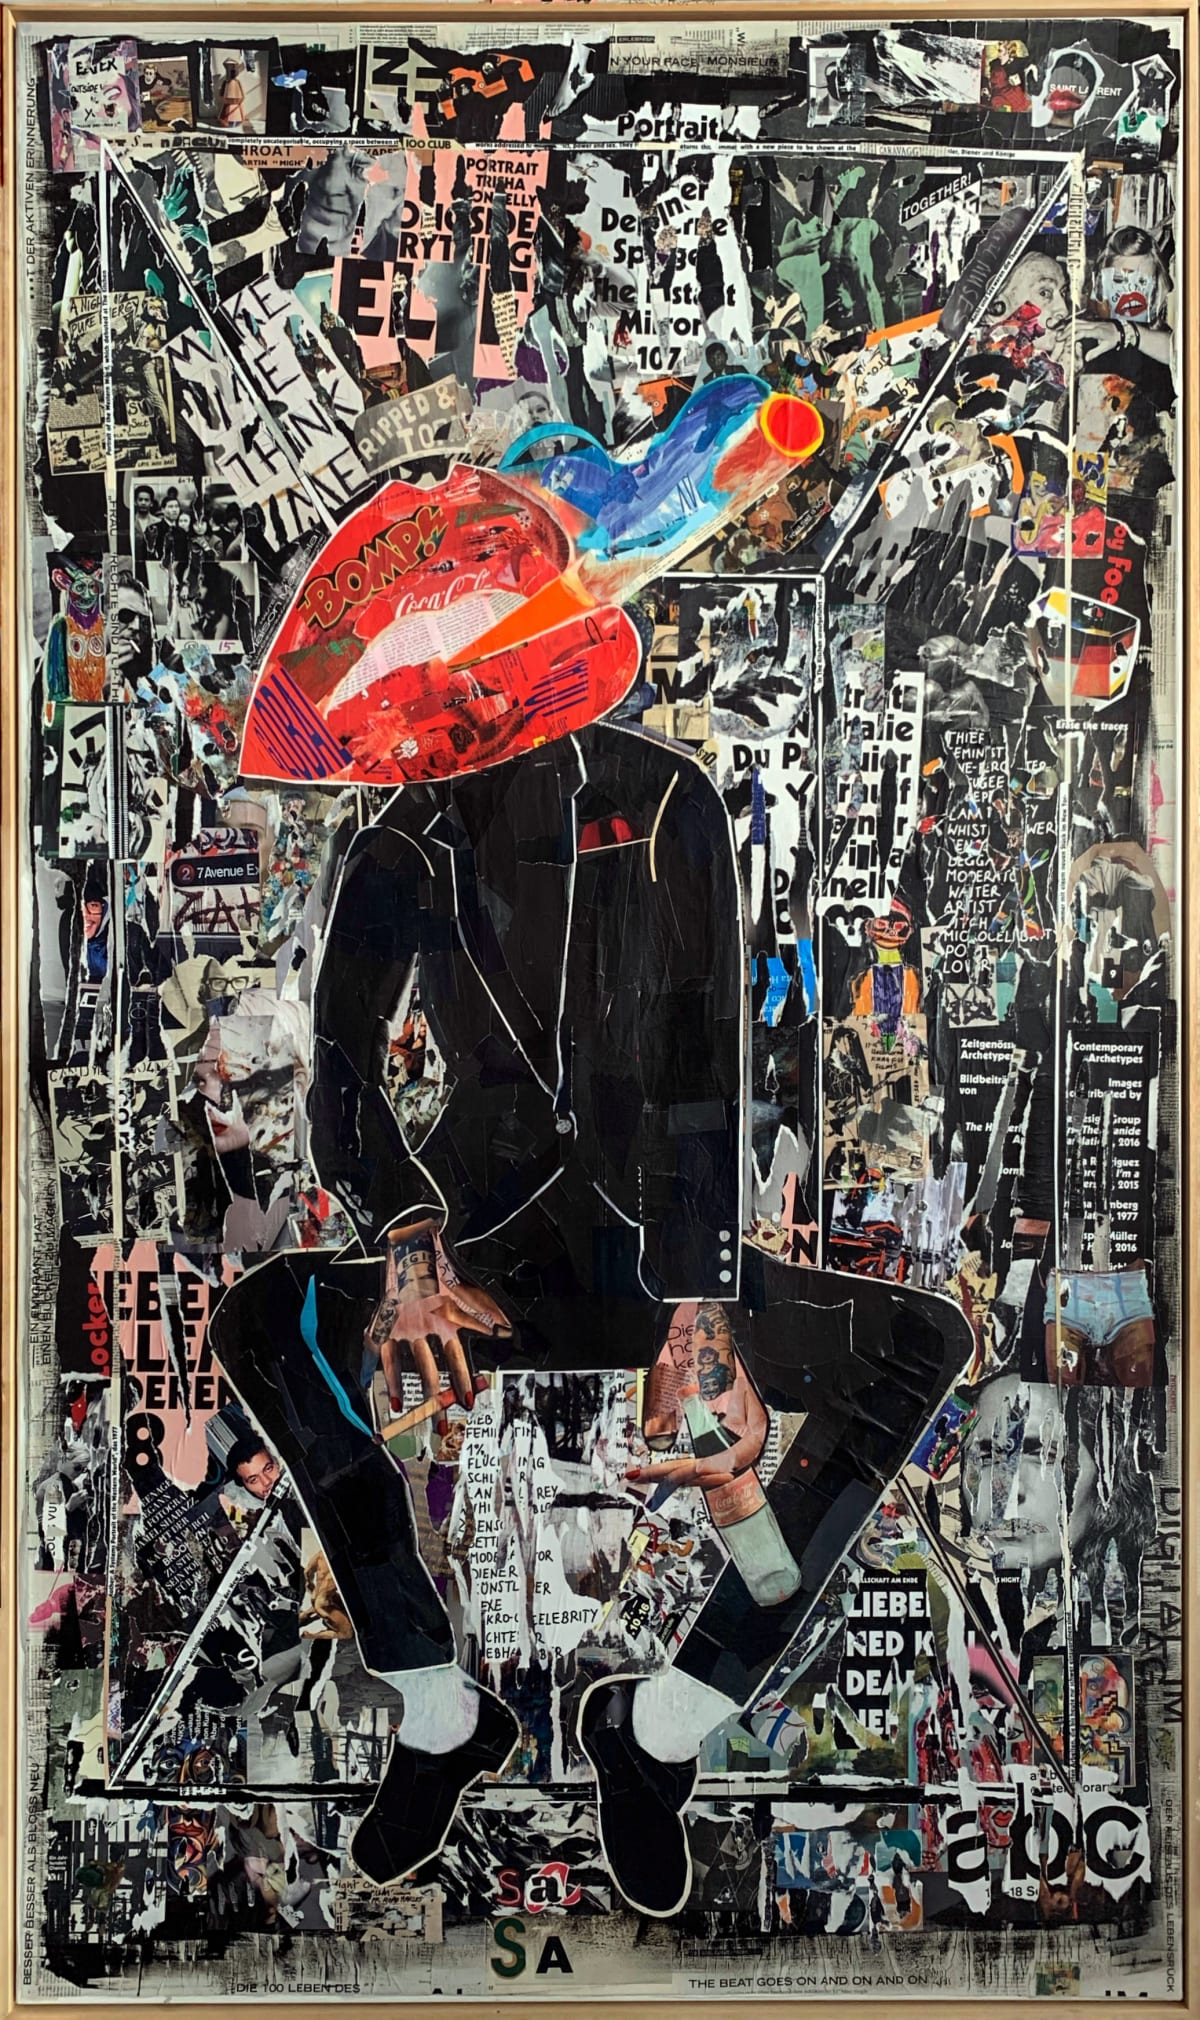 Sasha Knezevic Raucherpause (Smoko), 2019 Mixed Media (Collage) on Canvas 200 x 120 cm 78 1/2 x 47 1/2 in